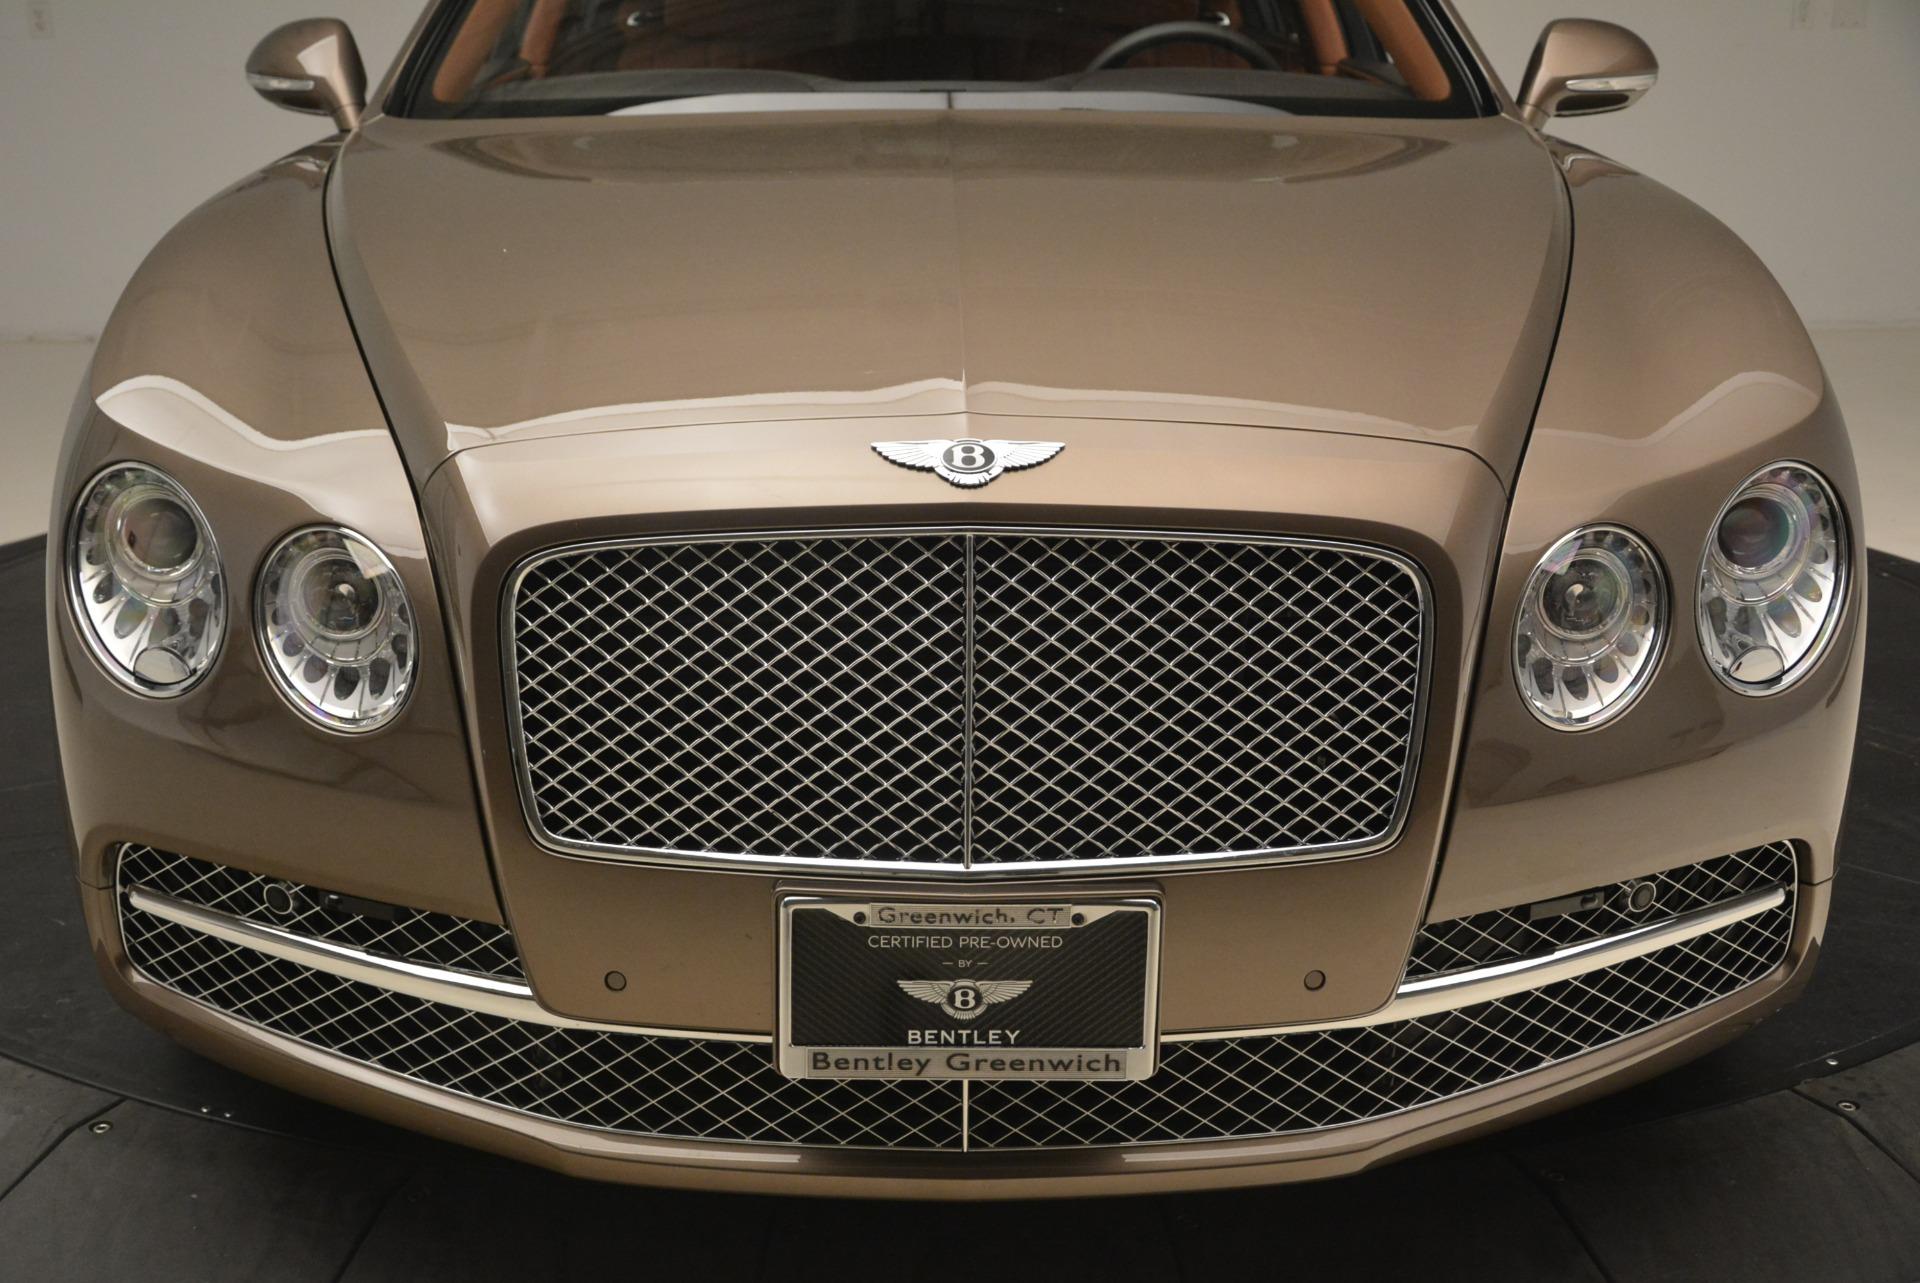 Used 2015 Bentley Flying Spur W12 For Sale In Westport, CT 2266_p13